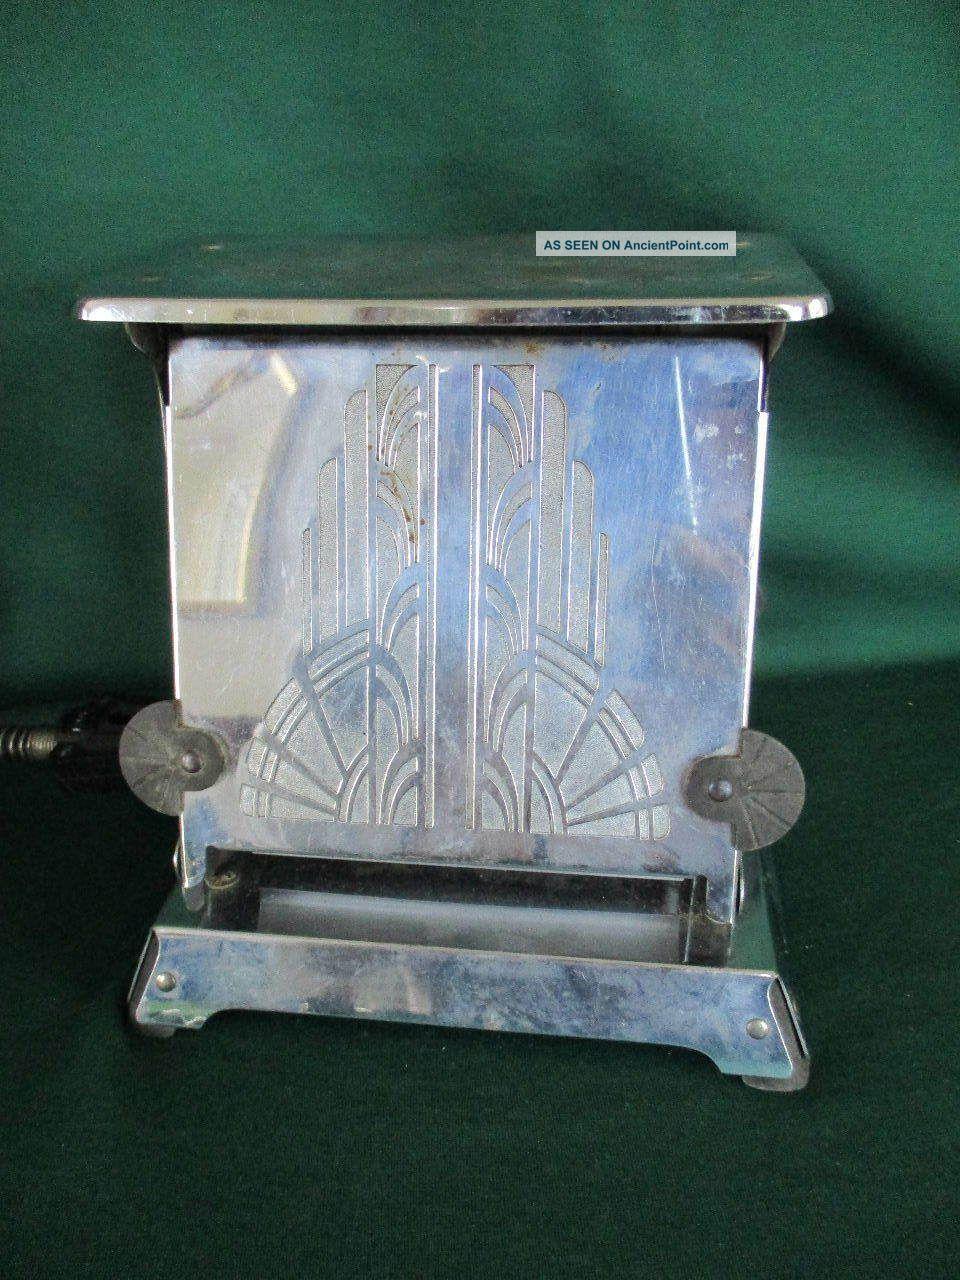 Vintage 1920 - 30 ' S Art Deco Era Westinghouse Turnover Toaster Great Ttc - 94 Toasters photo